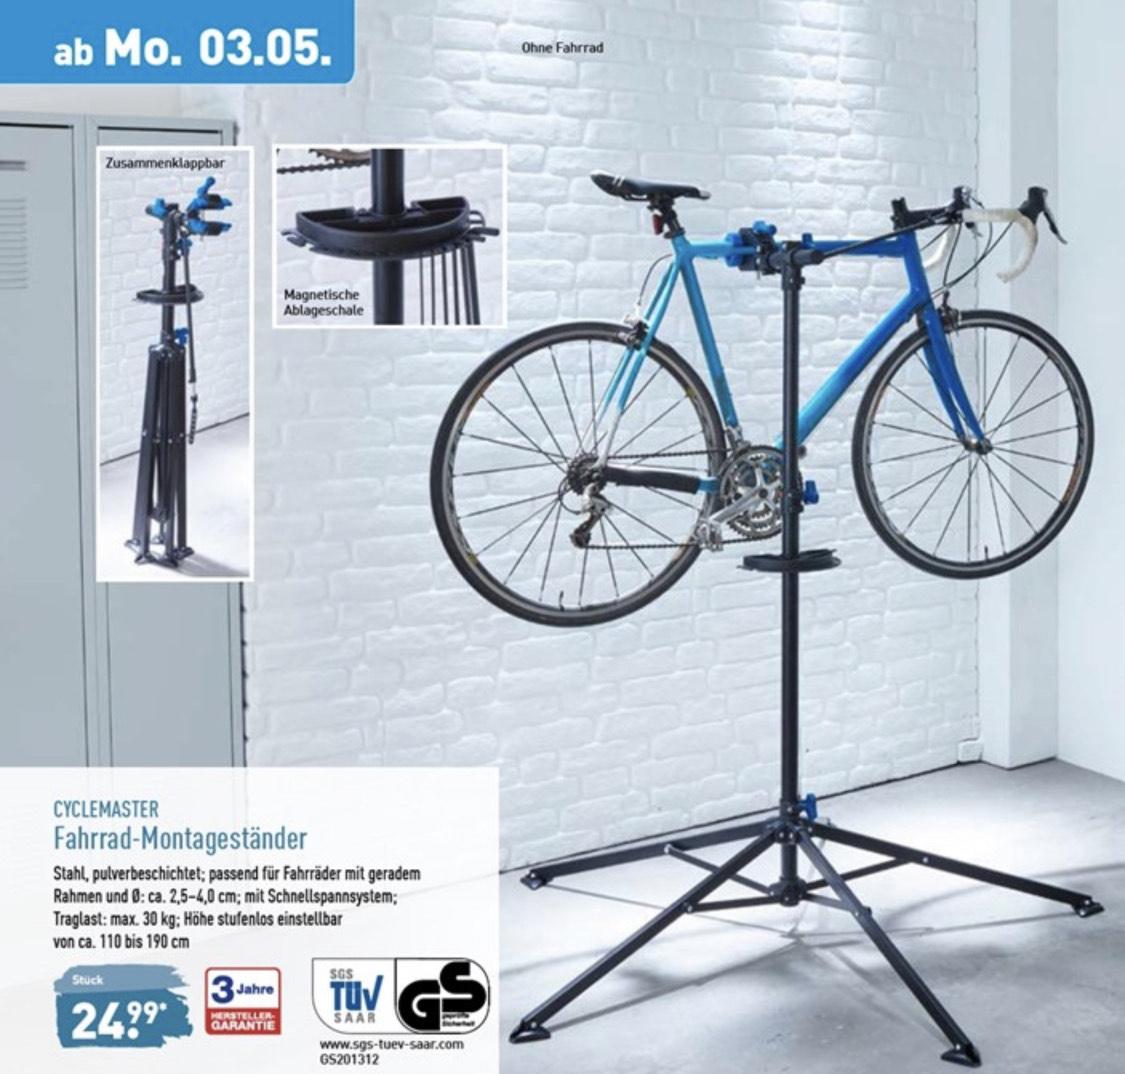 (Aldi Nord) CYCLEMASTER Fahrrad-Montageständer